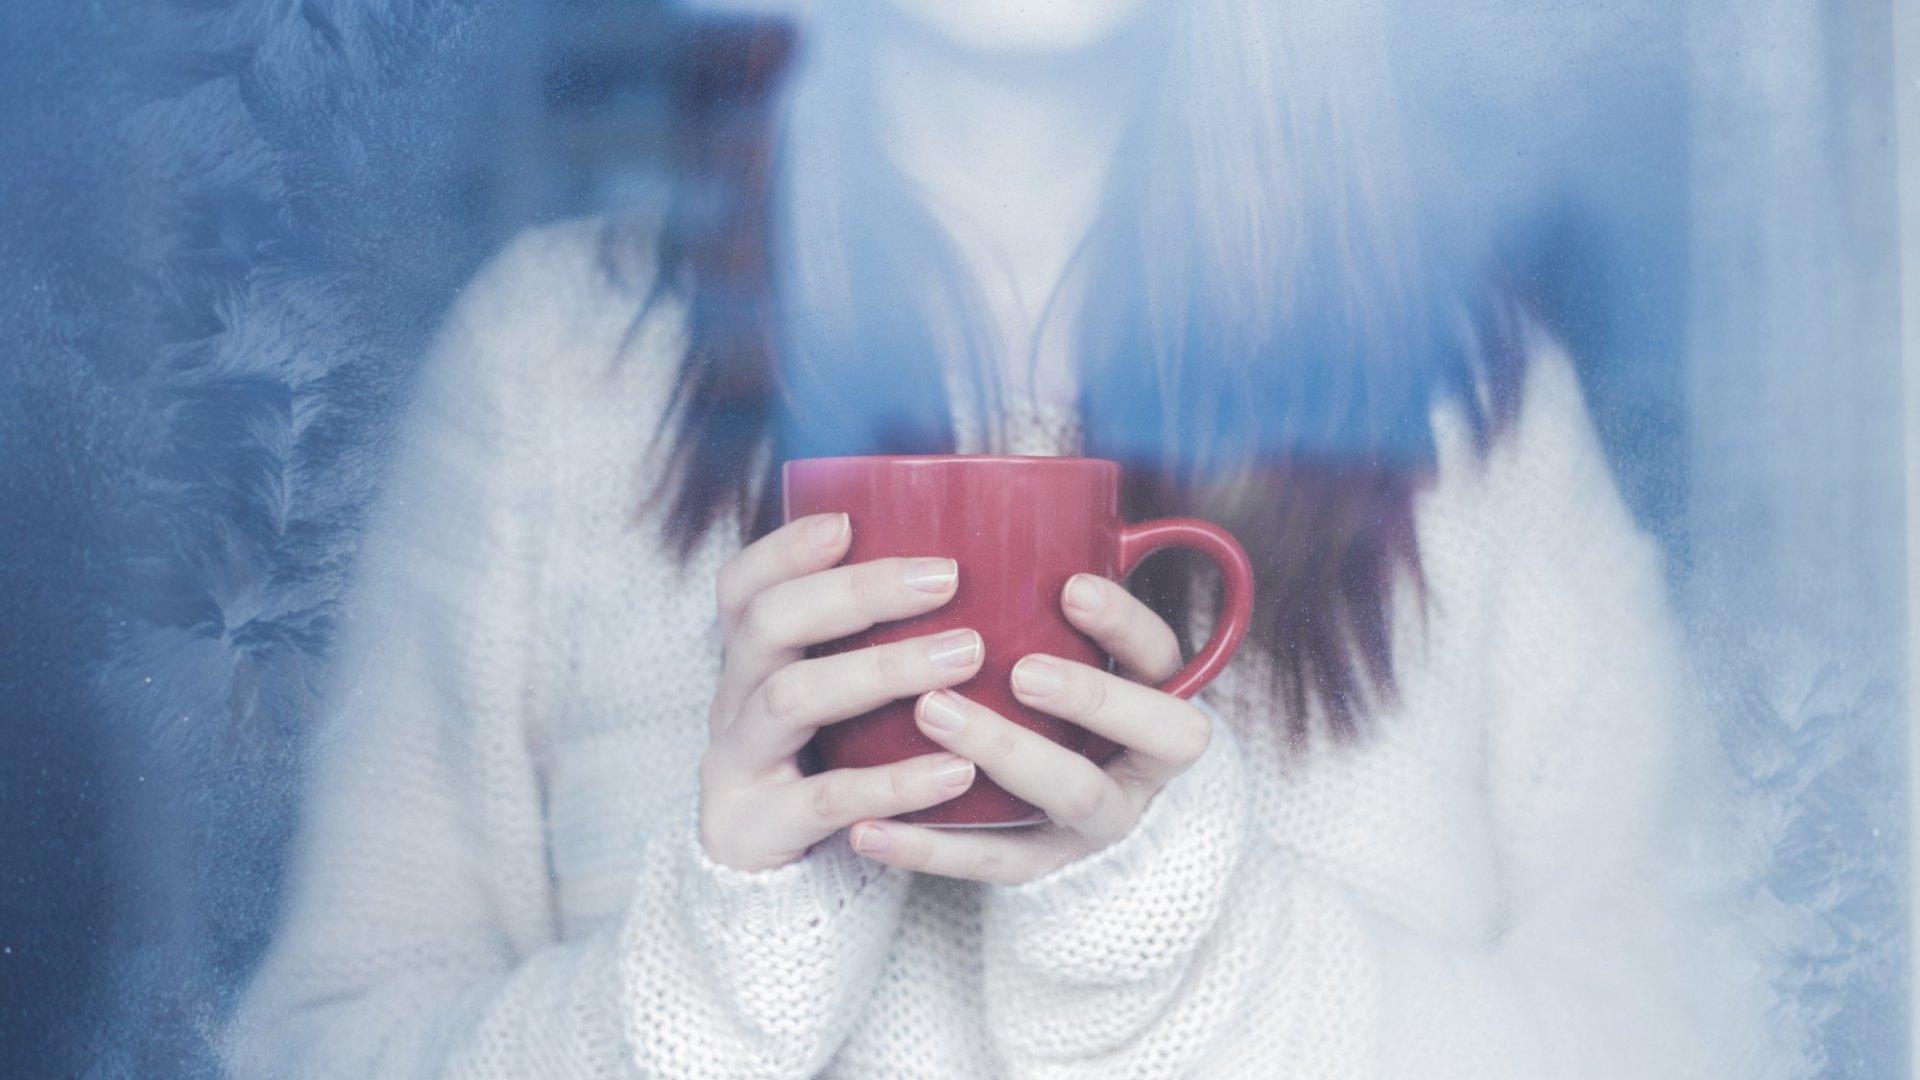 6 Ways to Combat Seasonal Affective Disorder This Winter